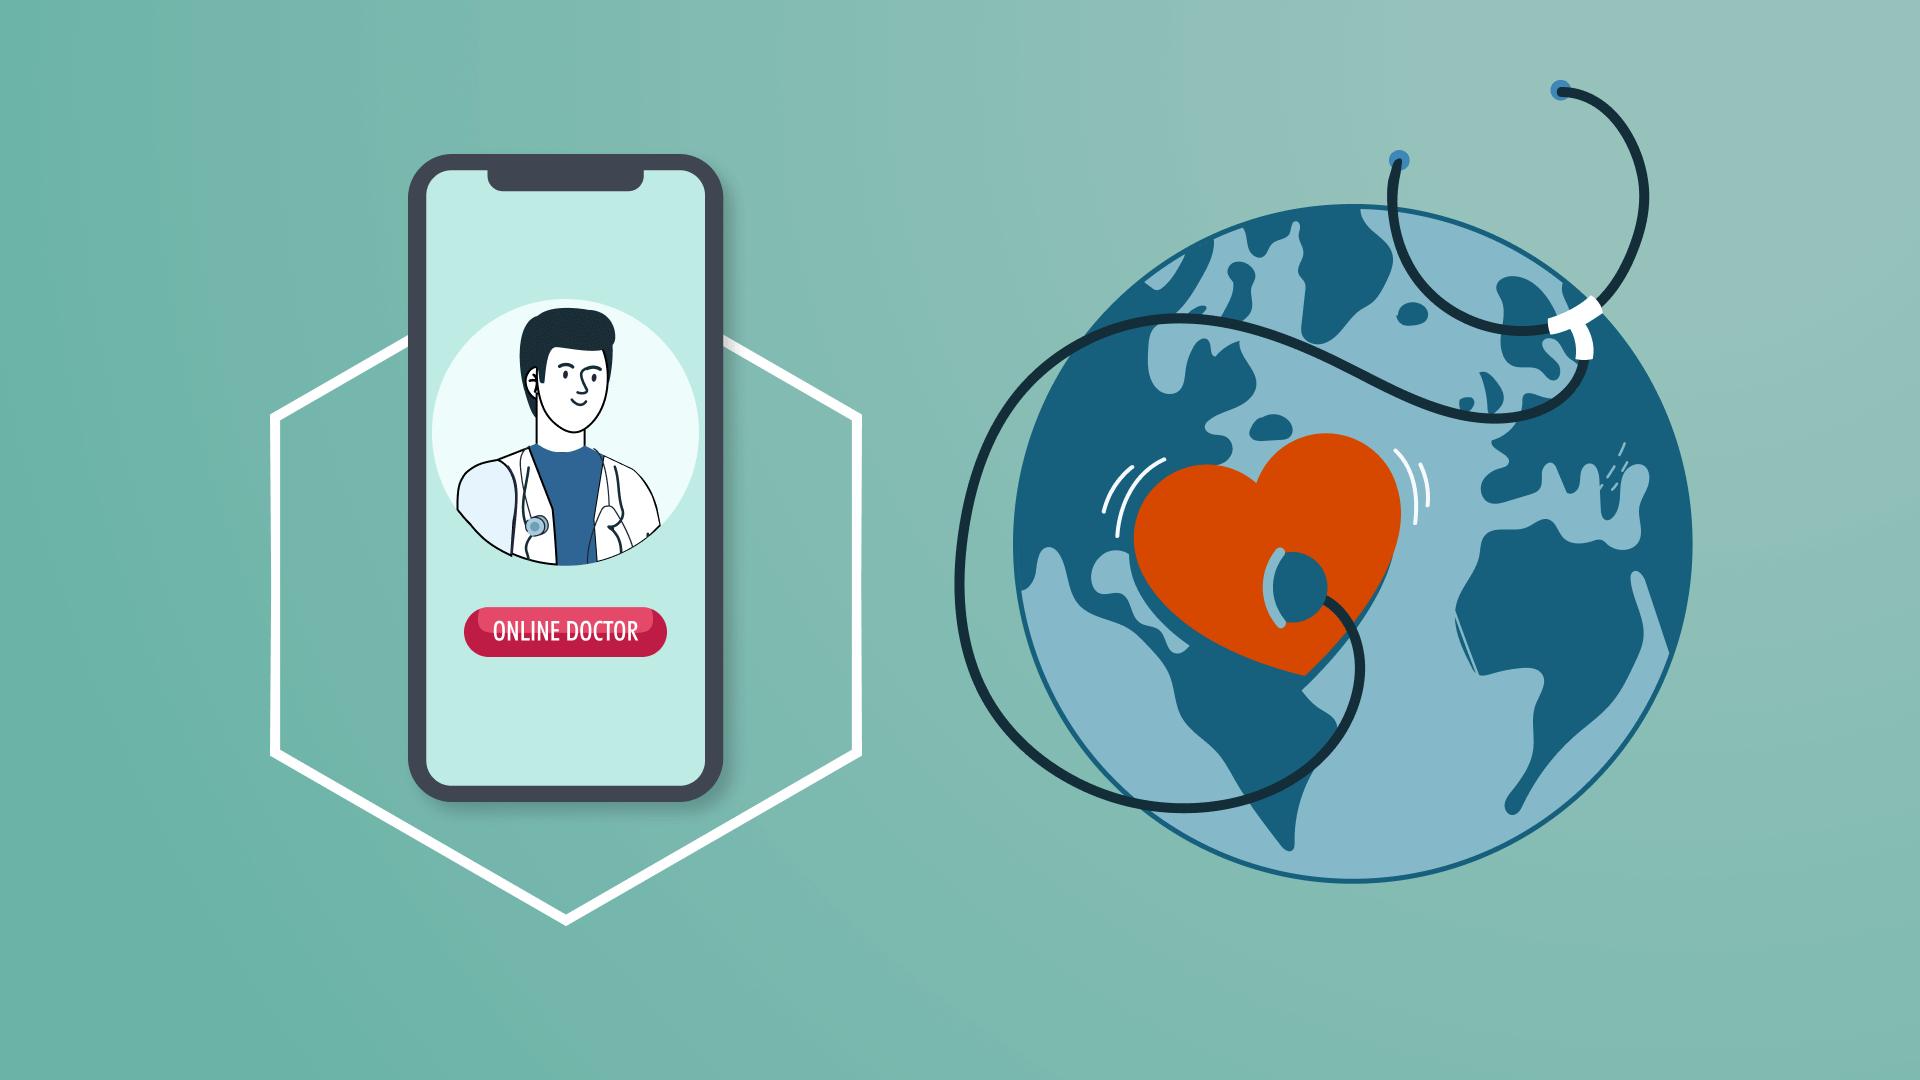 Dịch vụ xây dựng web/app và healthcare marketing cho Telemedicine & Telehealth